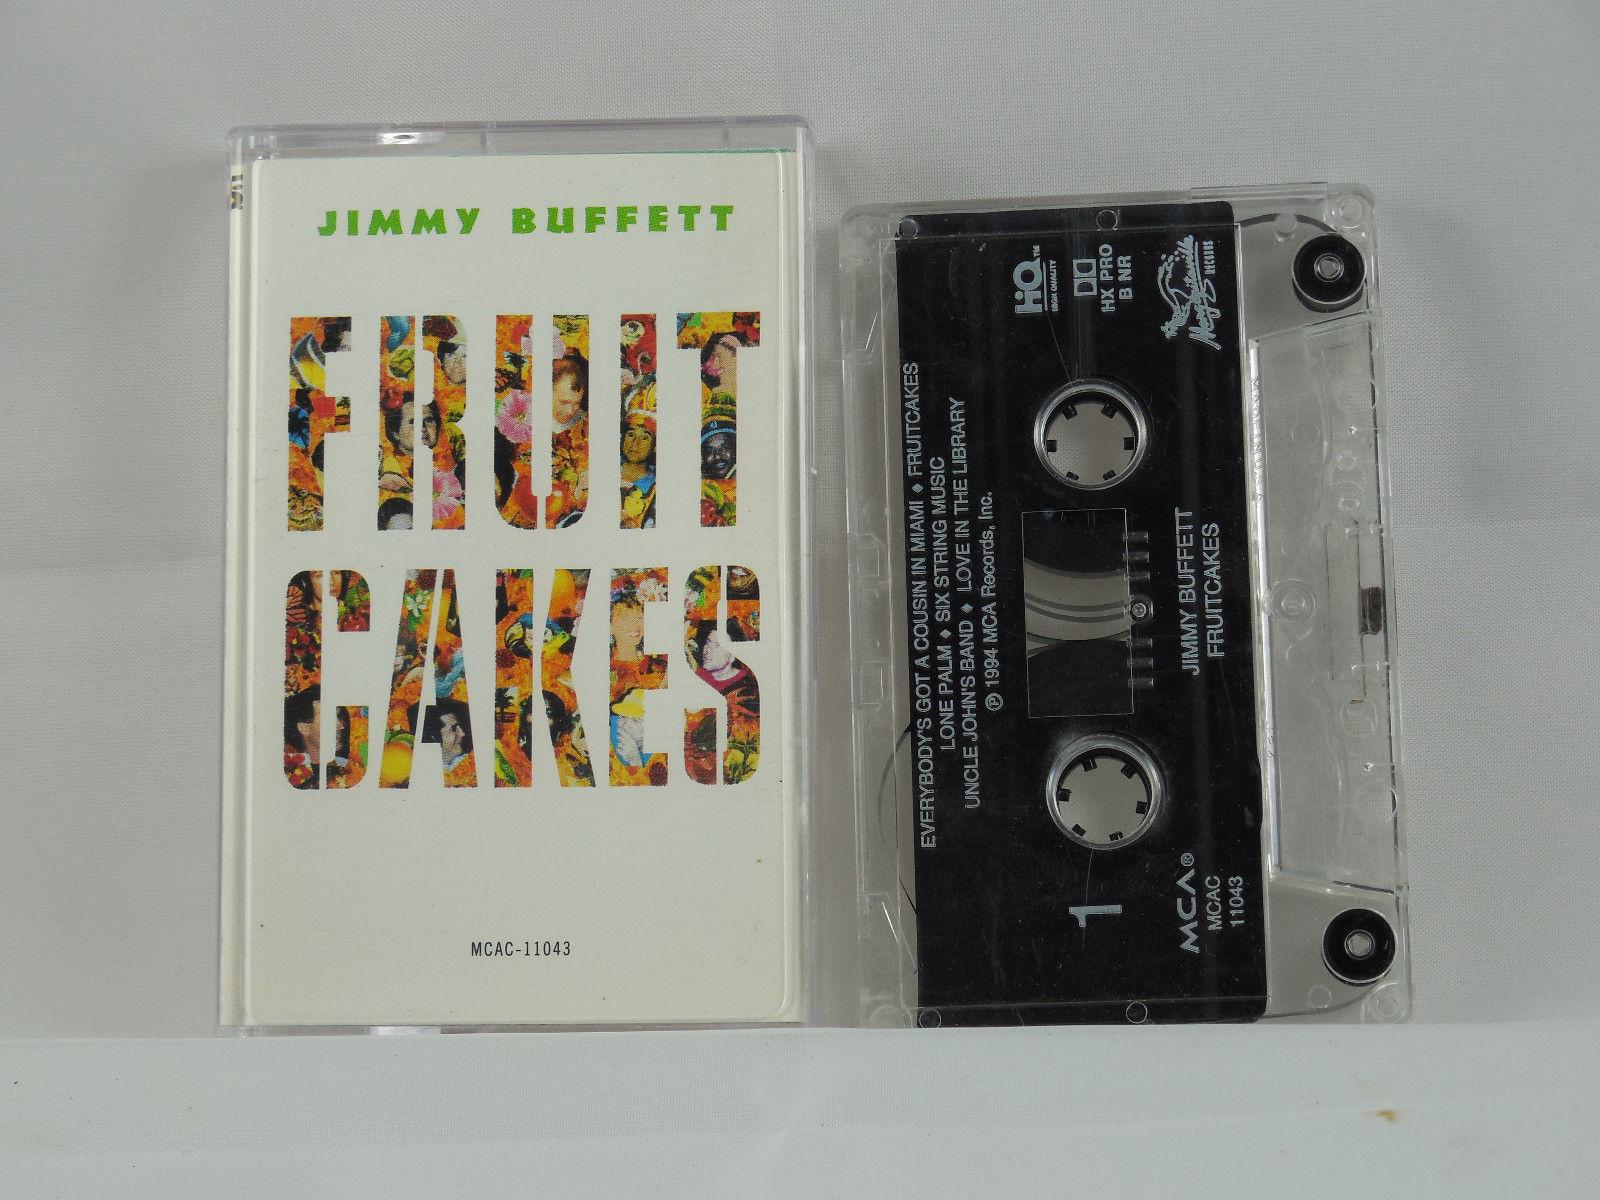 JIMMY BUFFETT FRUITCAKES CASSETTE 1982